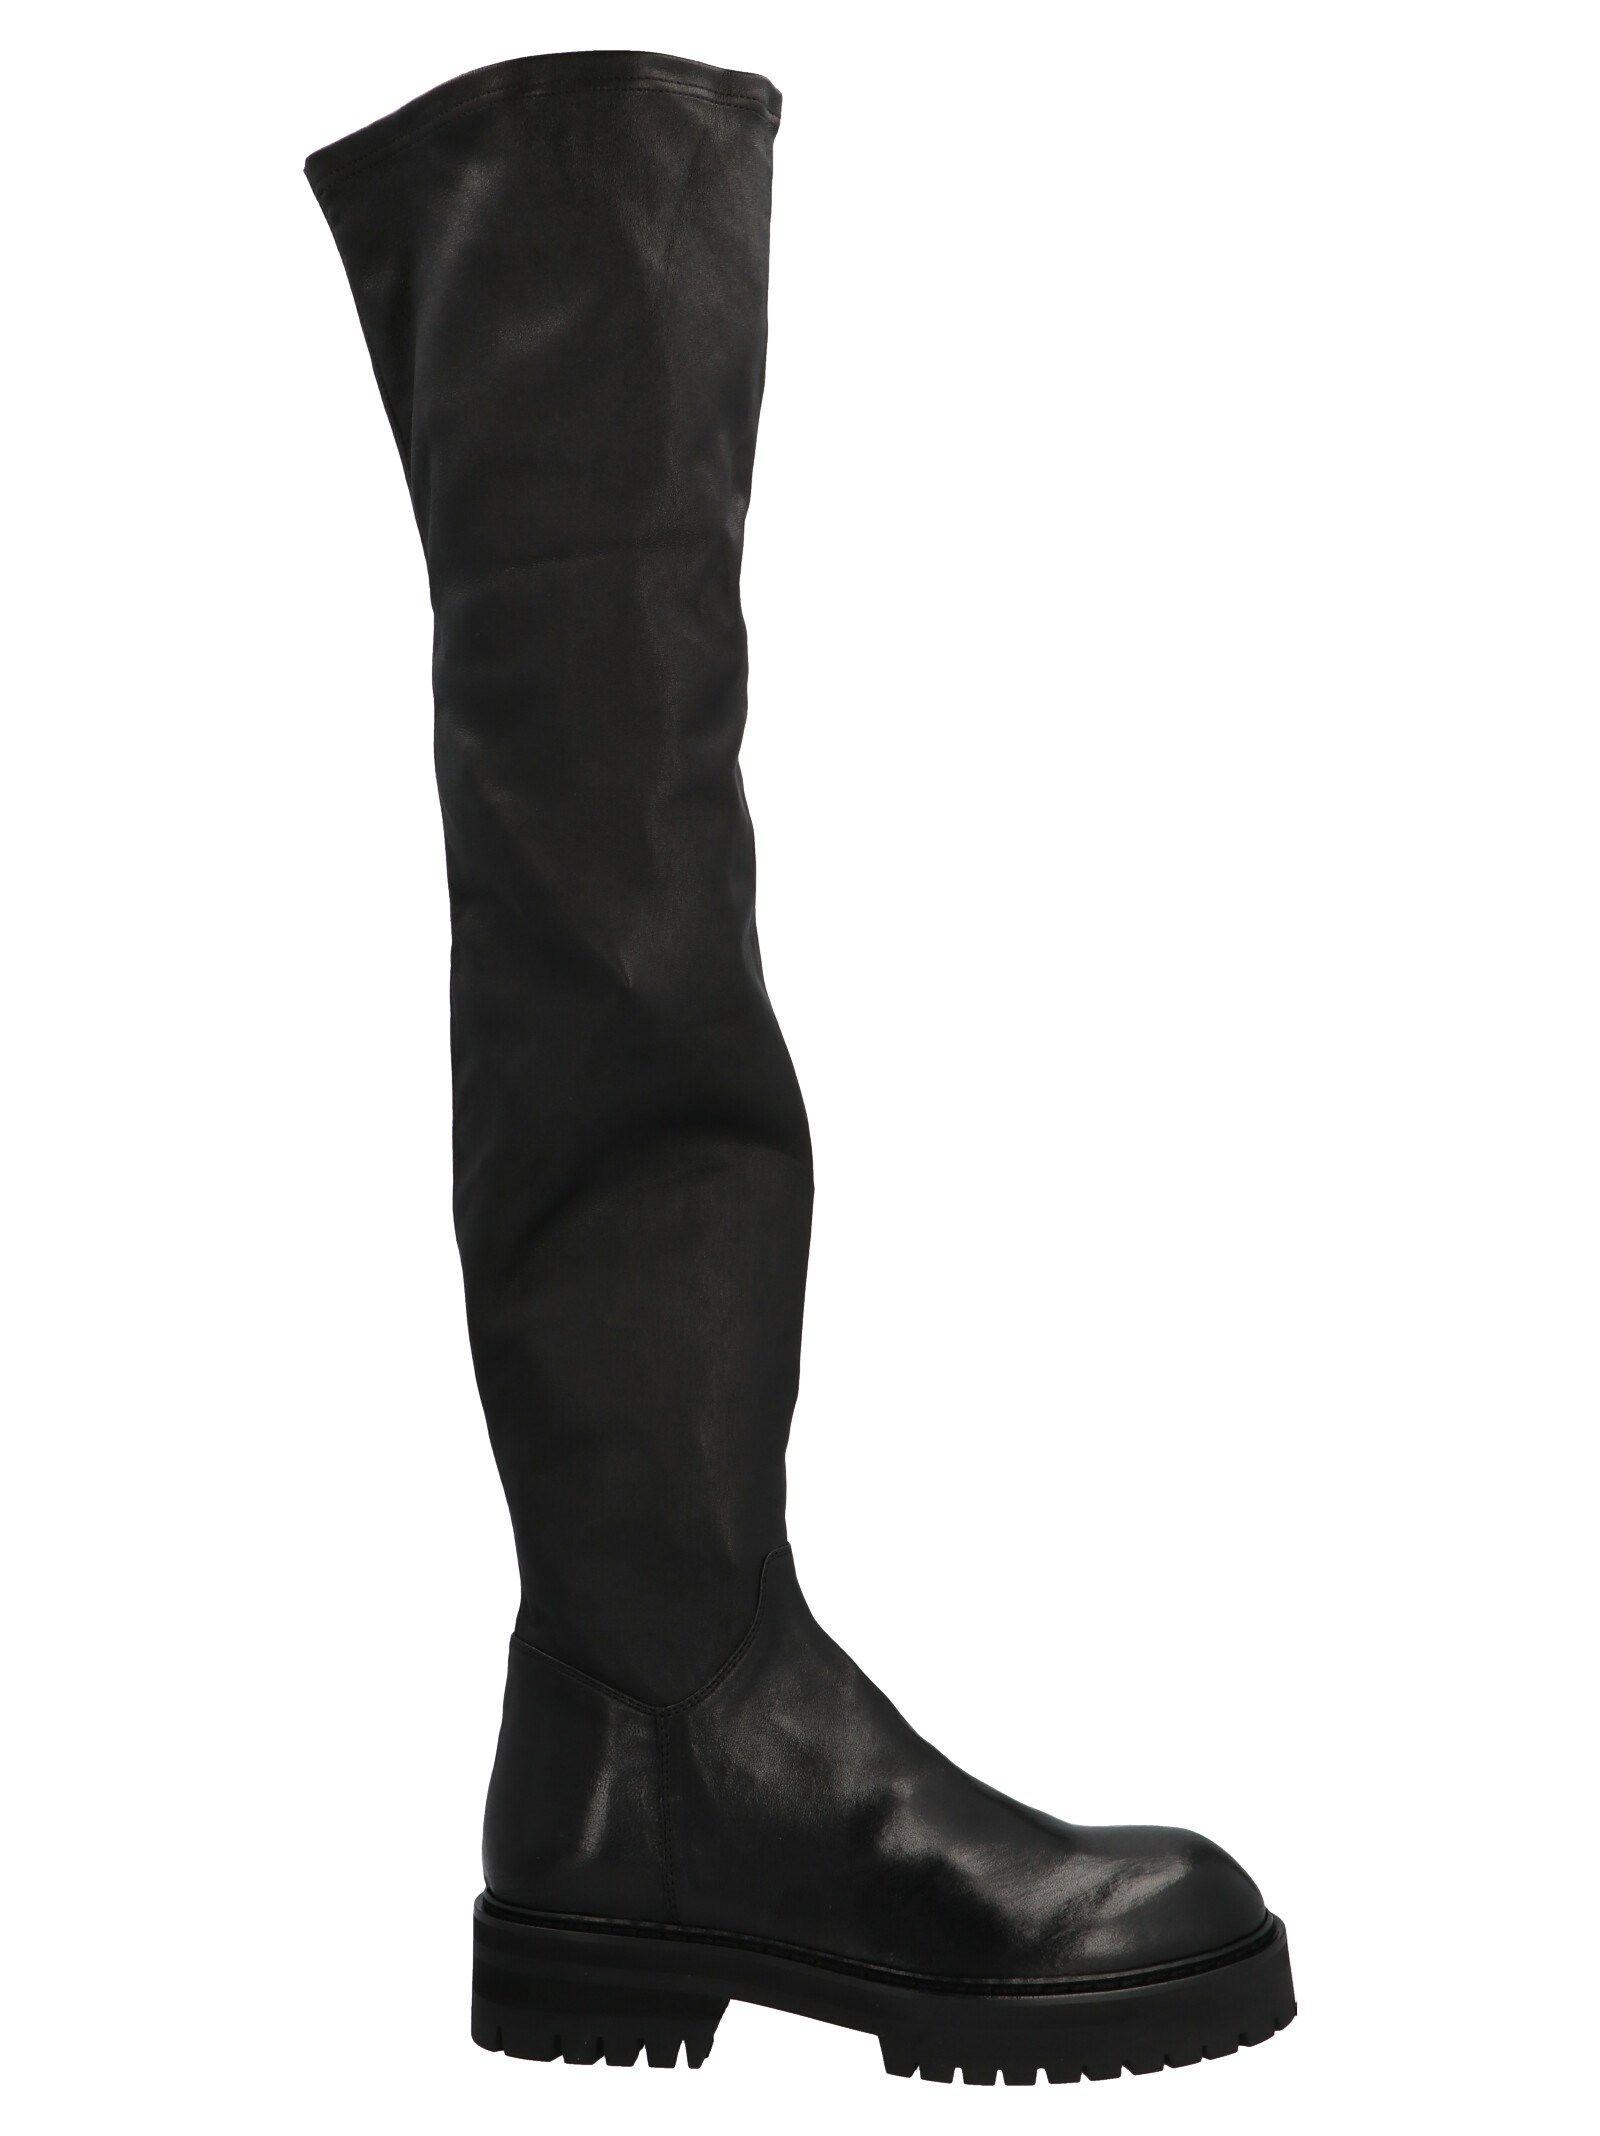 Ann Demeulemeester ANN DEMEULEMEESTER WOMEN'S BLACK ANKLE BOOTS